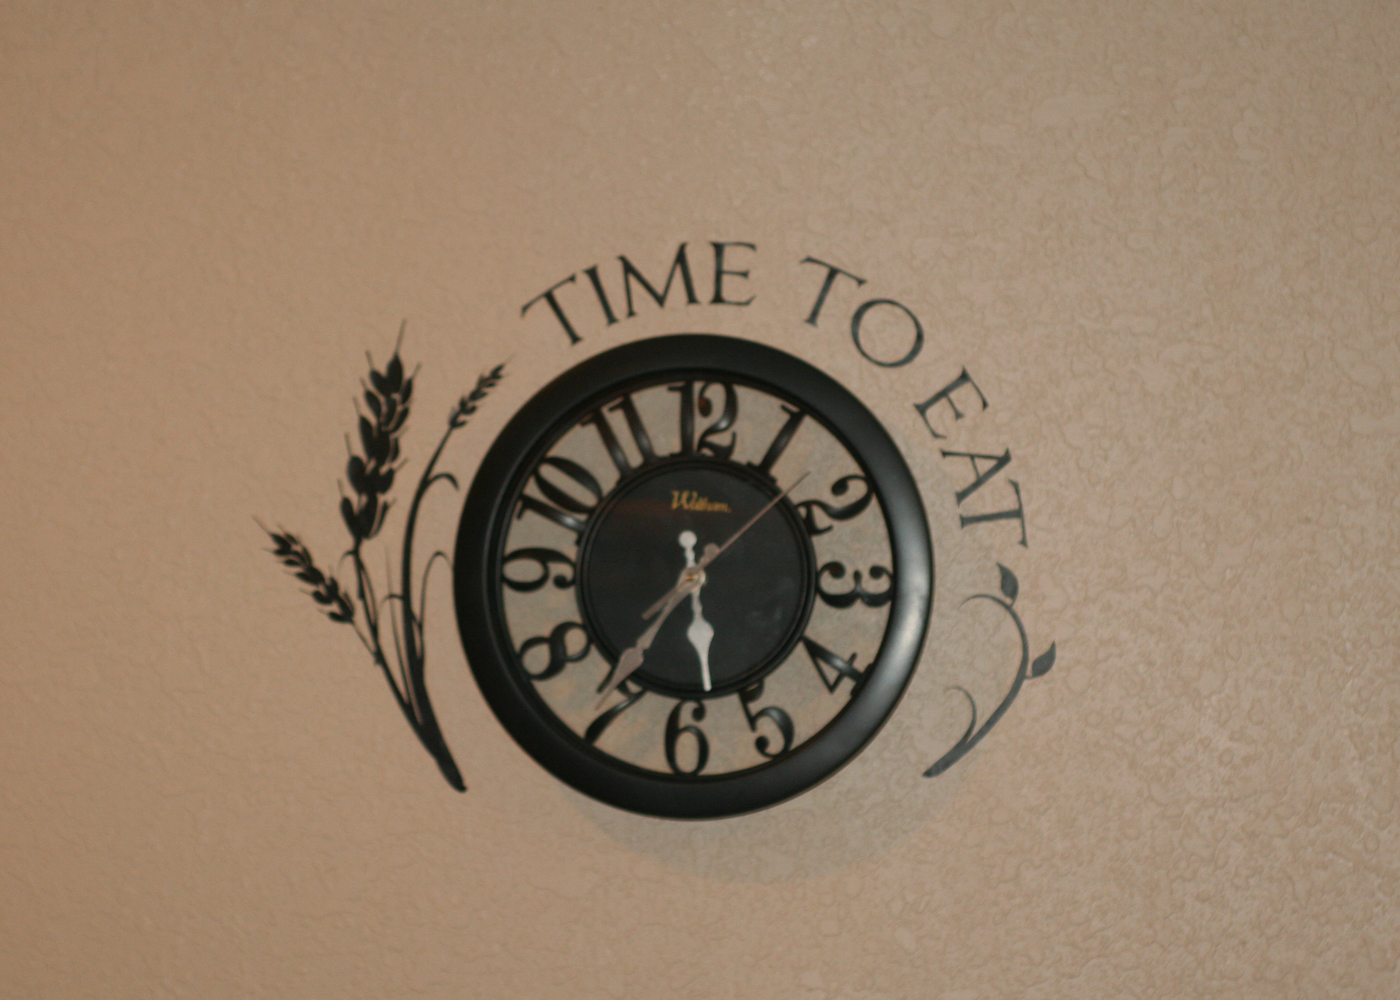 clock-wall-art-decal-time-to-eat-custom.jpg